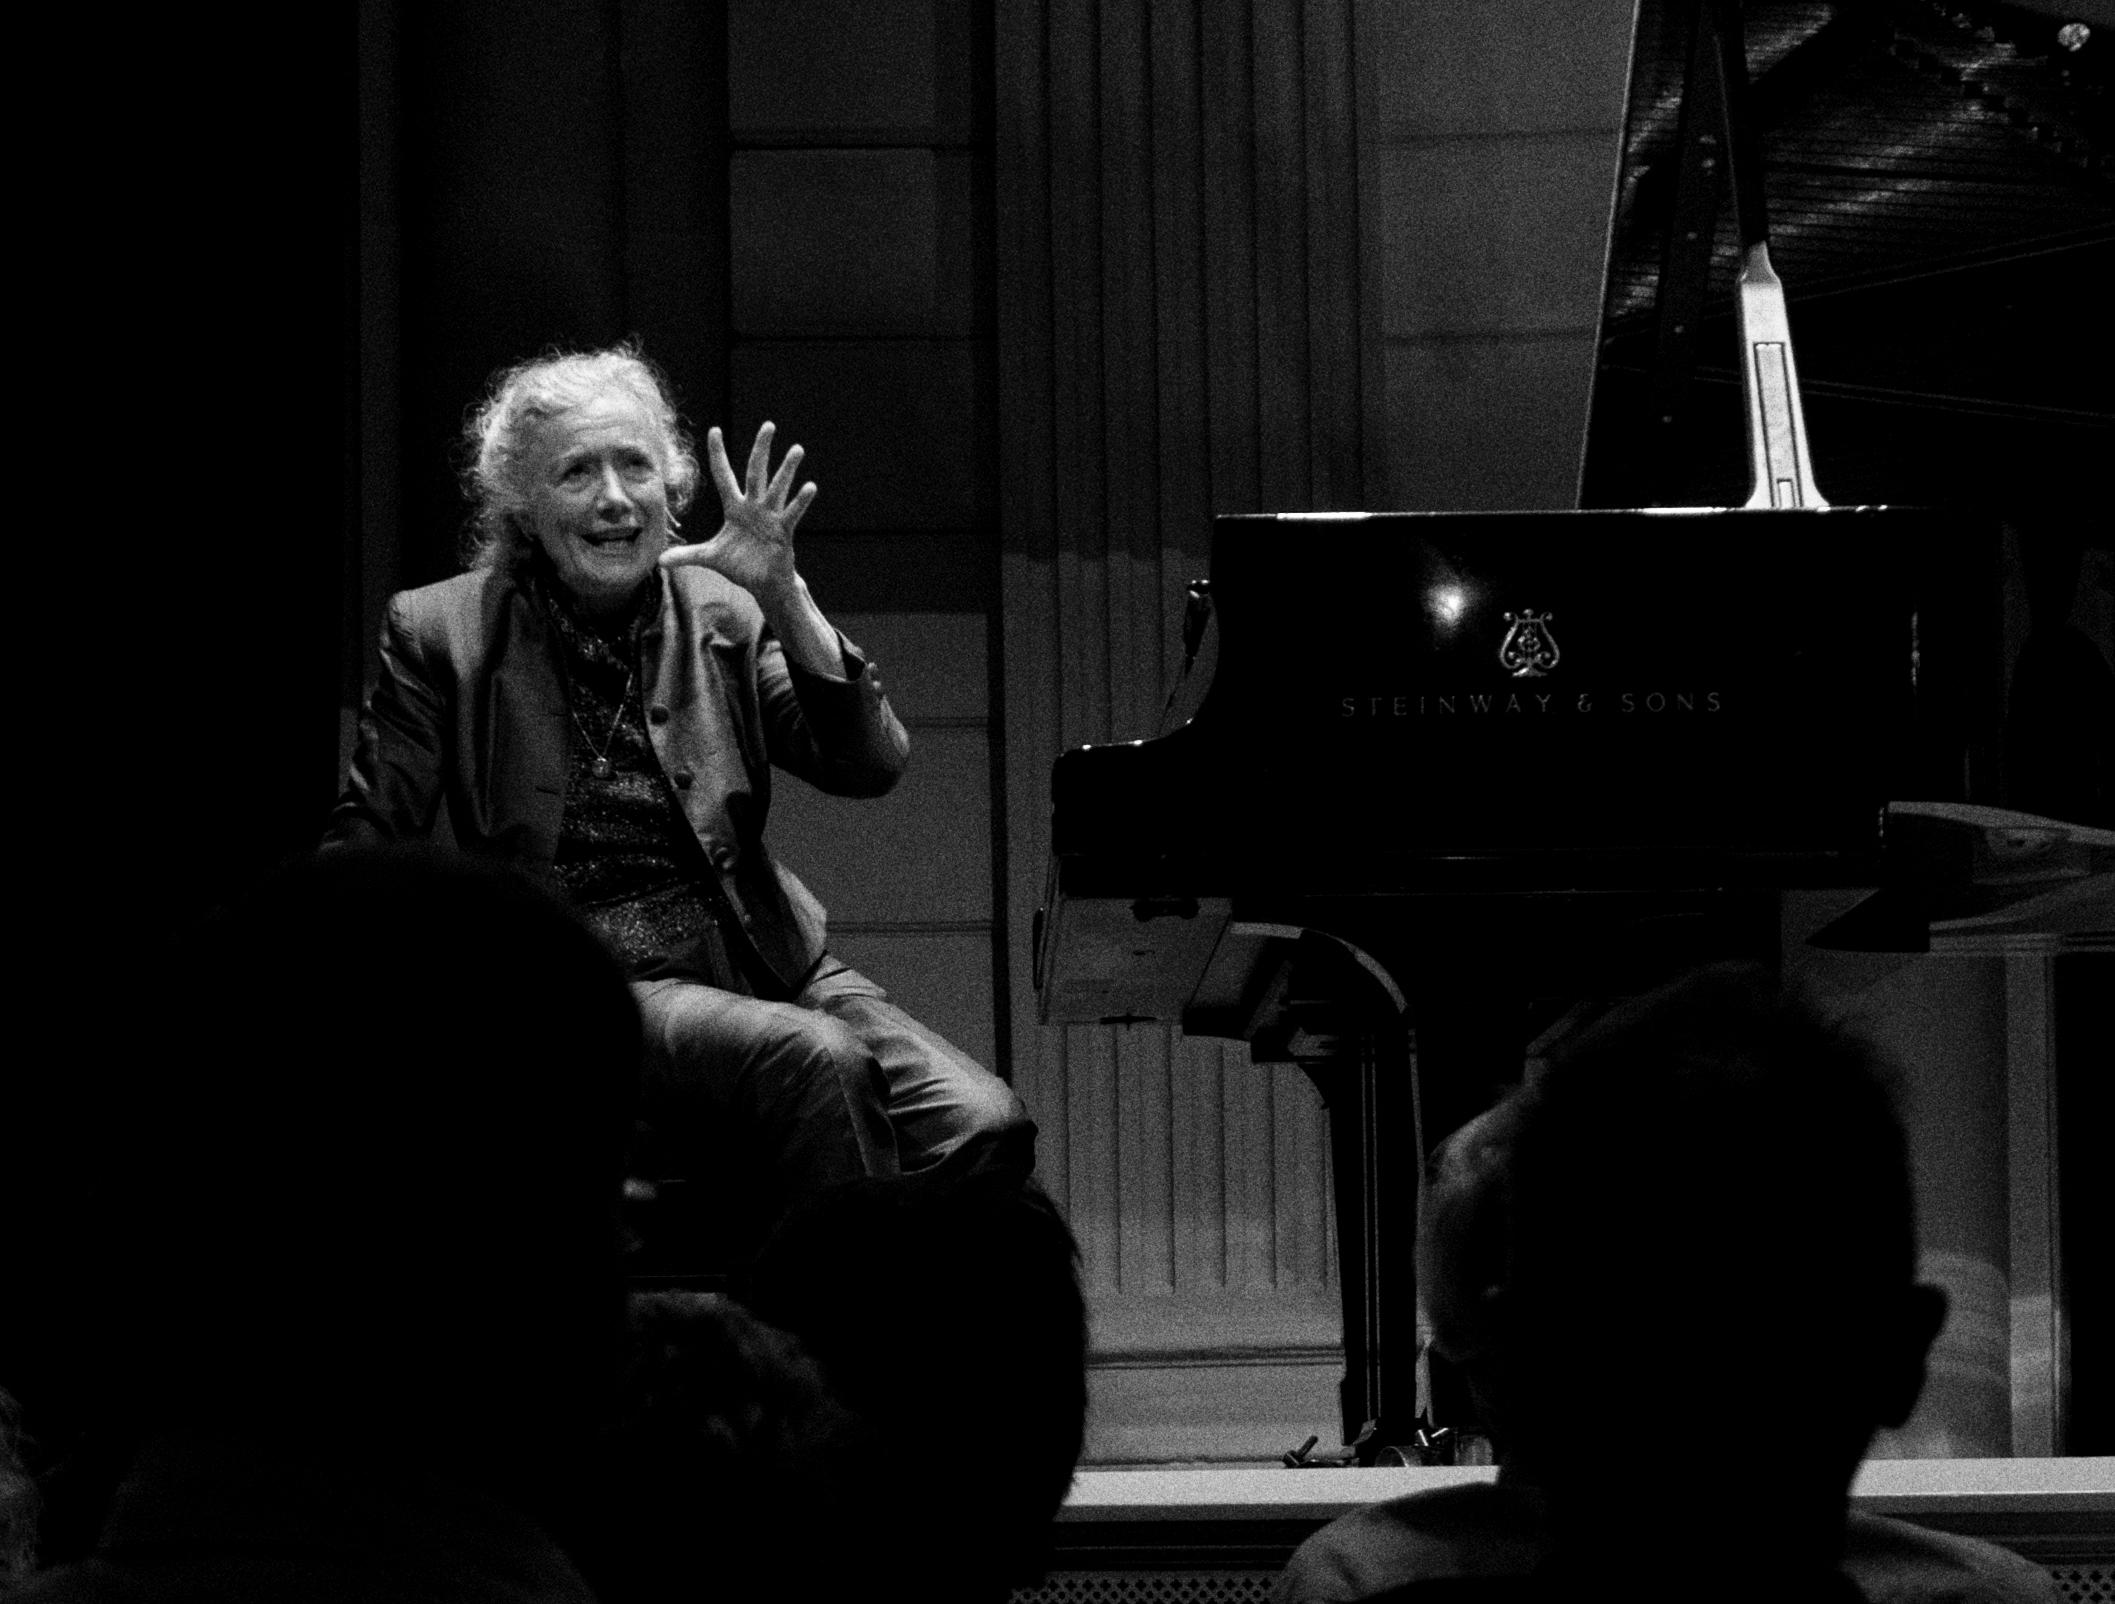 Barbara Nissman at the [[Concertgebouw]], 2017